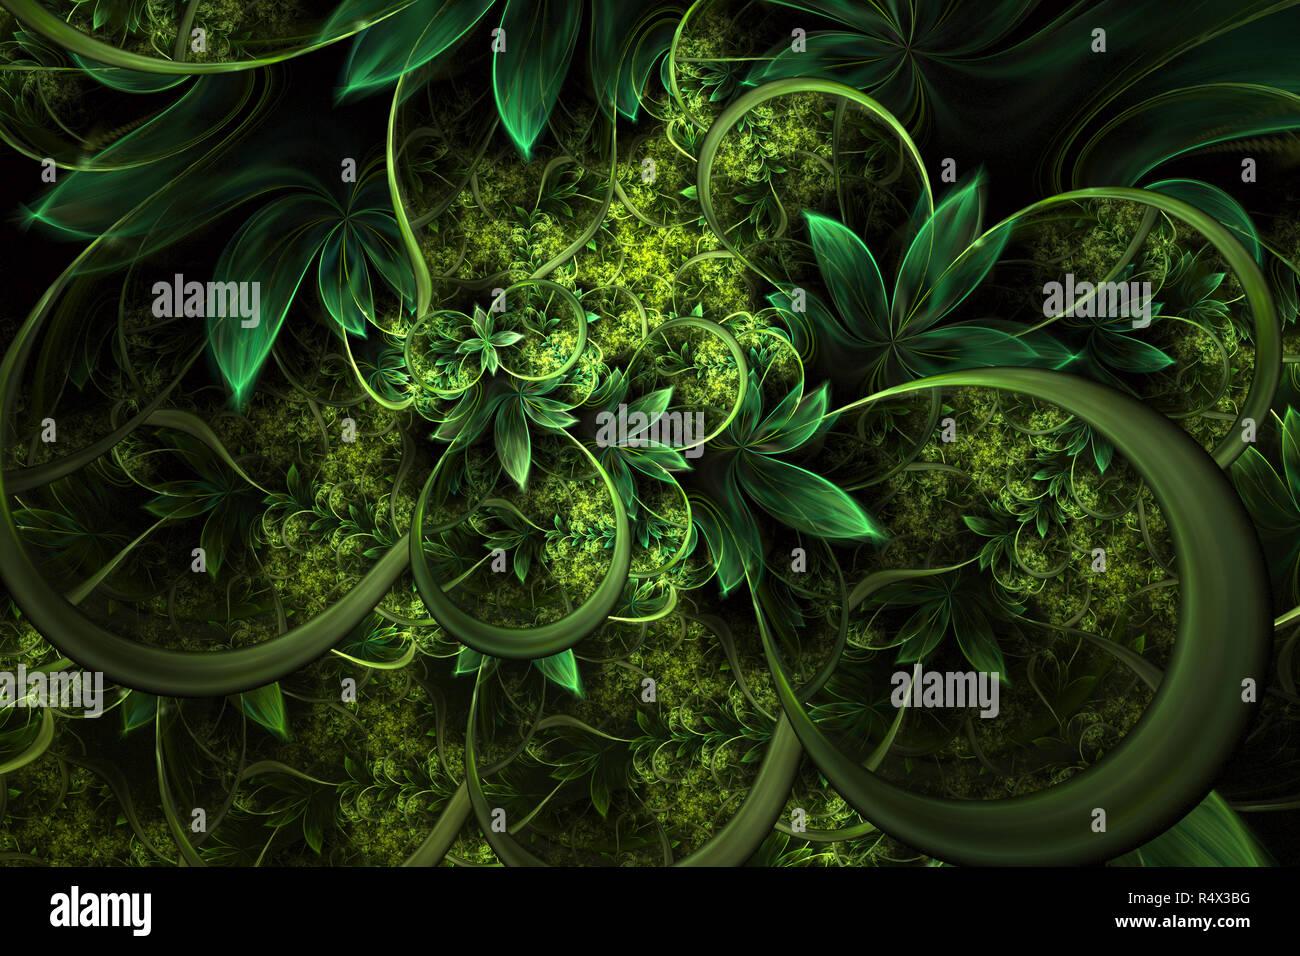 Abstract Computer Generated Plant Fractal Design Digital Artwork For Tablet Background Desktop Wallpaper Or For Creative Cover Design Stock Photo Alamy